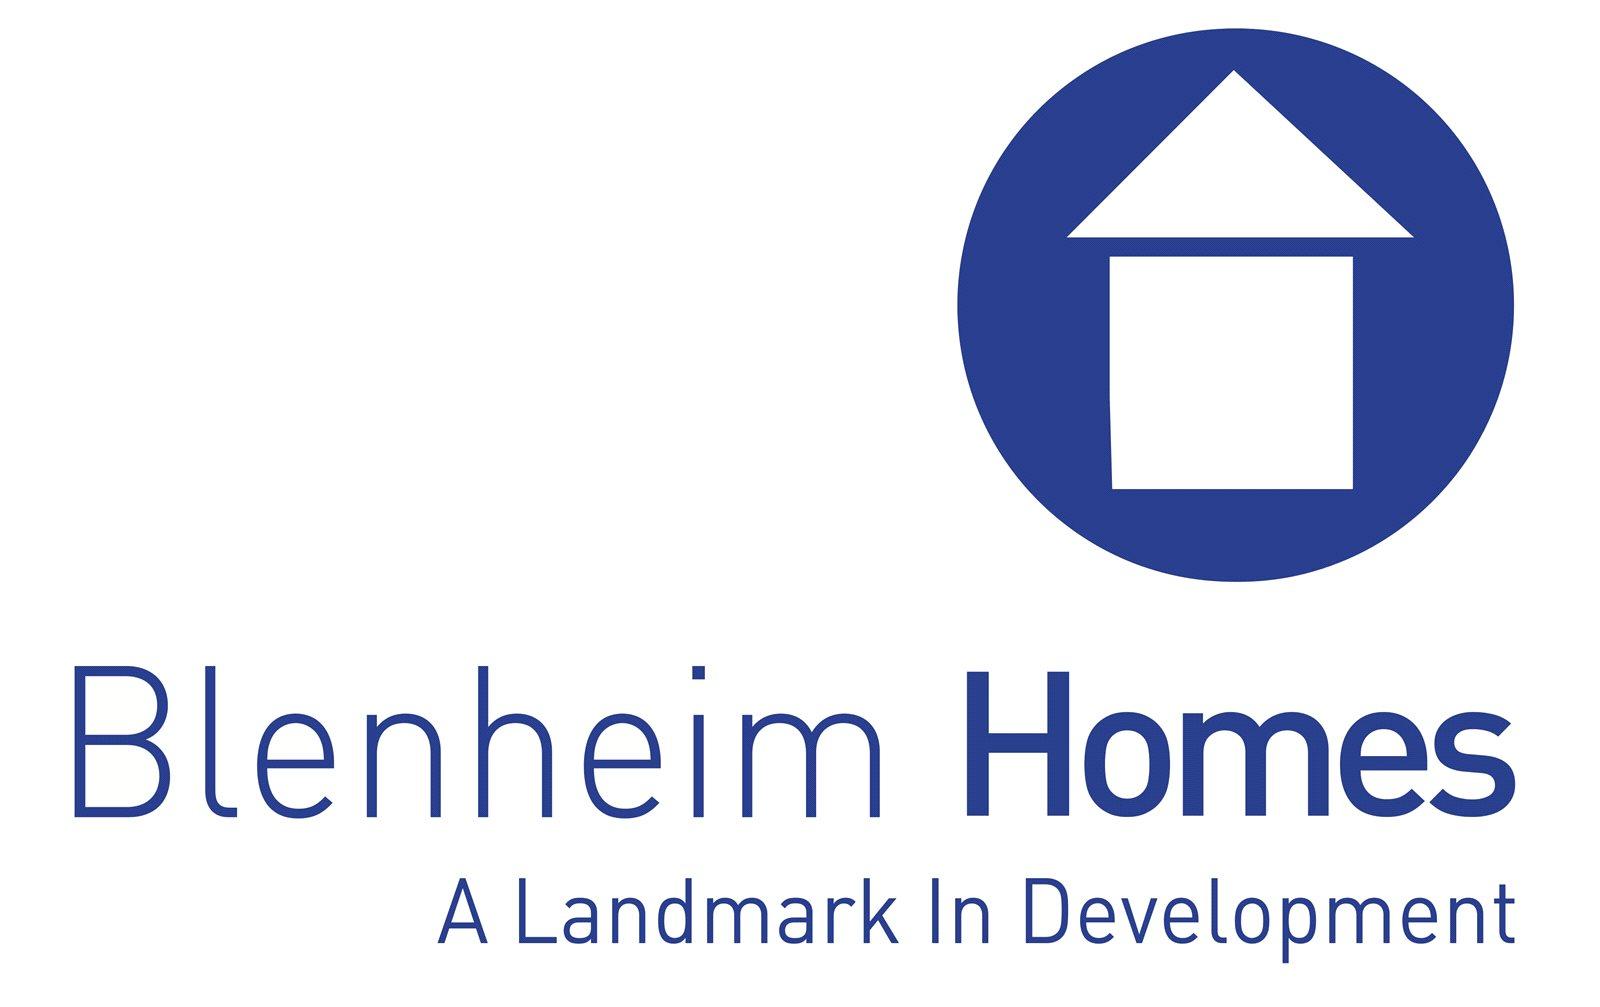 blenheim homes,COMPANY